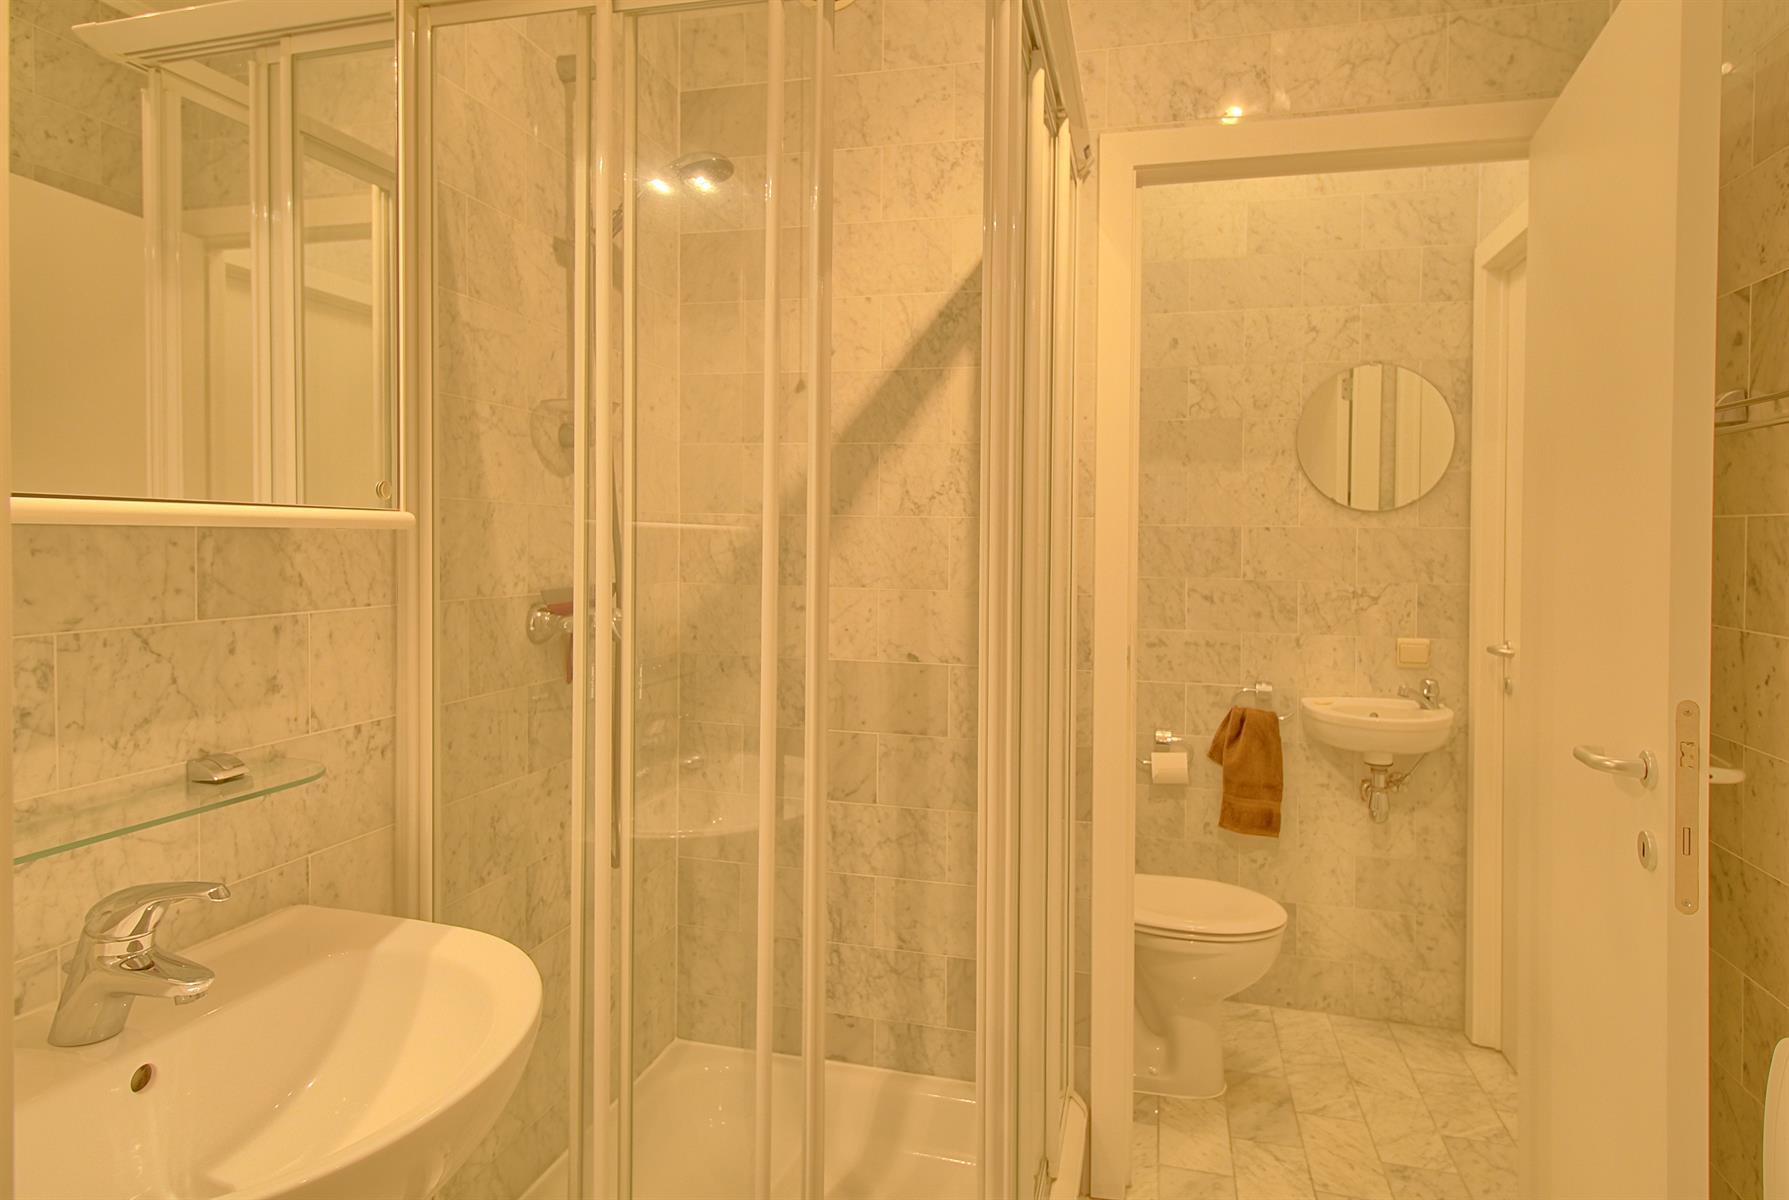 Appartement - Woluwe-Saint-Lambert - #4208881-3